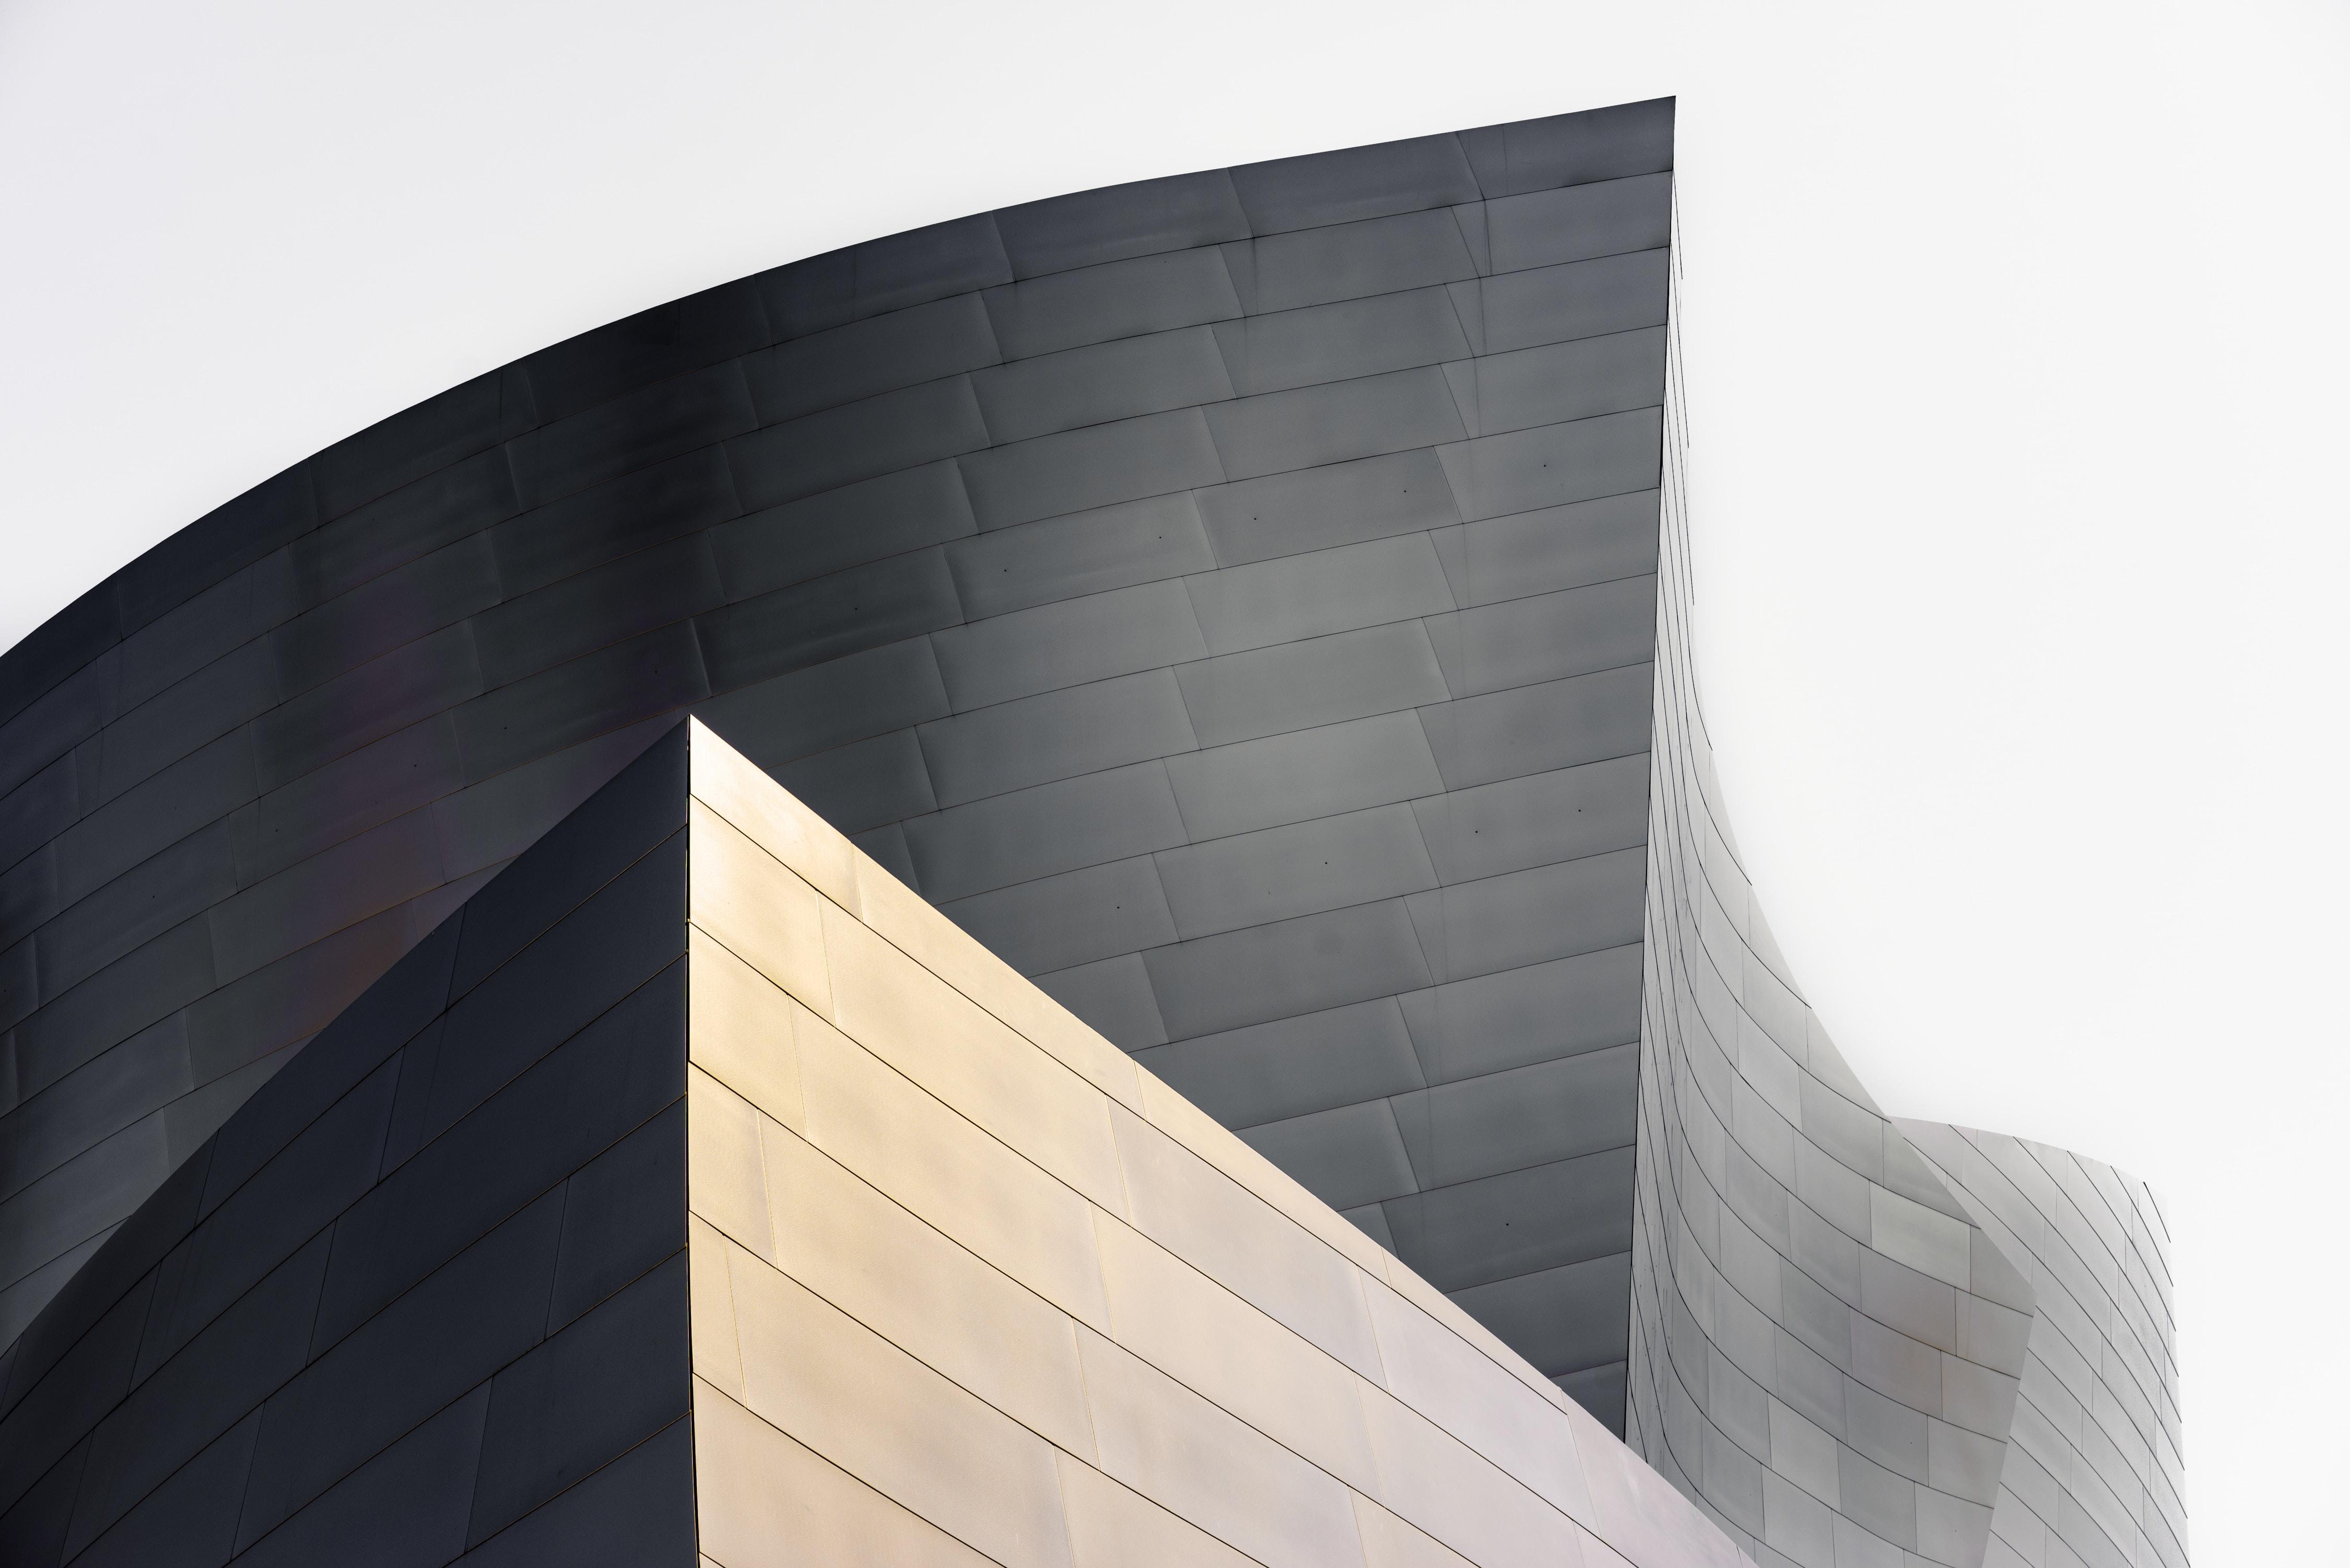 gray concrete building wall